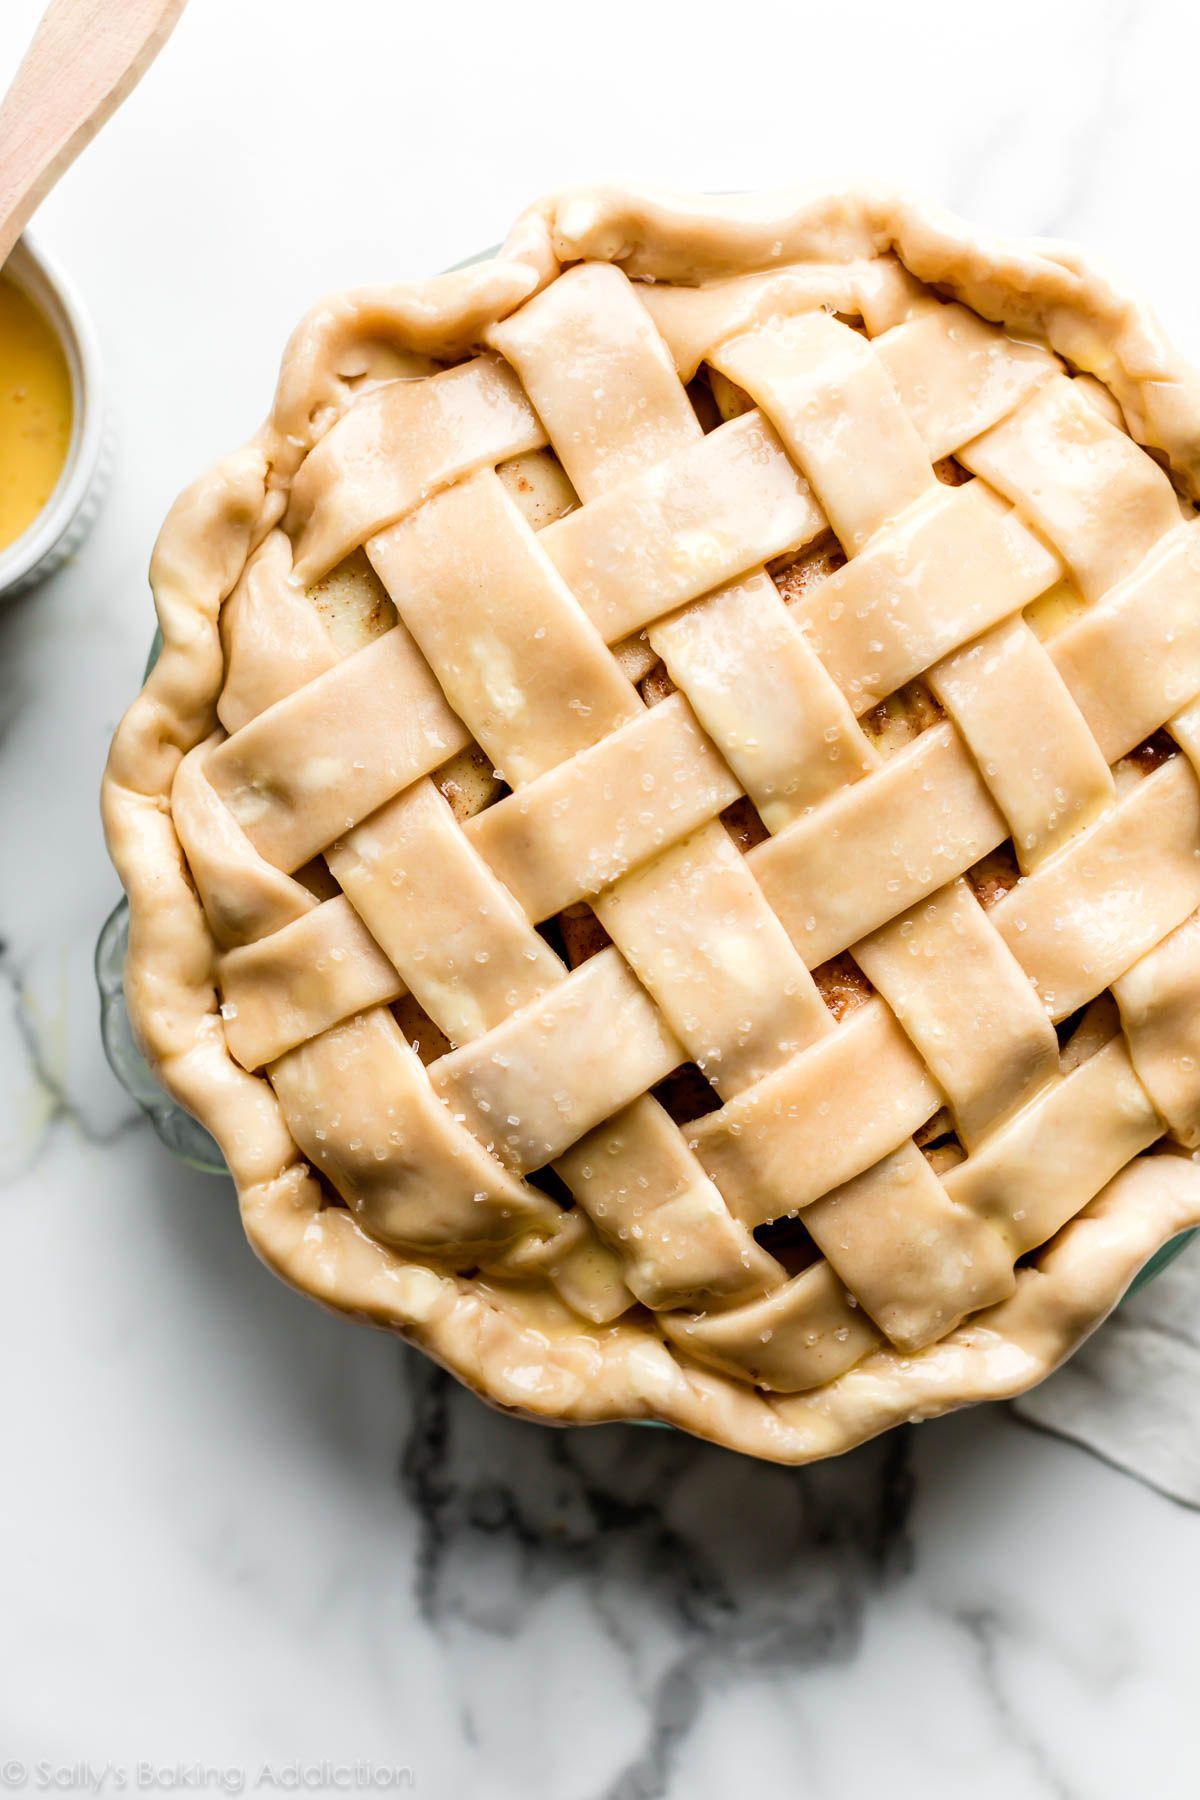 Full Tutorial To Lattice Pie Crust With A No Fail Pie Crust Recipe